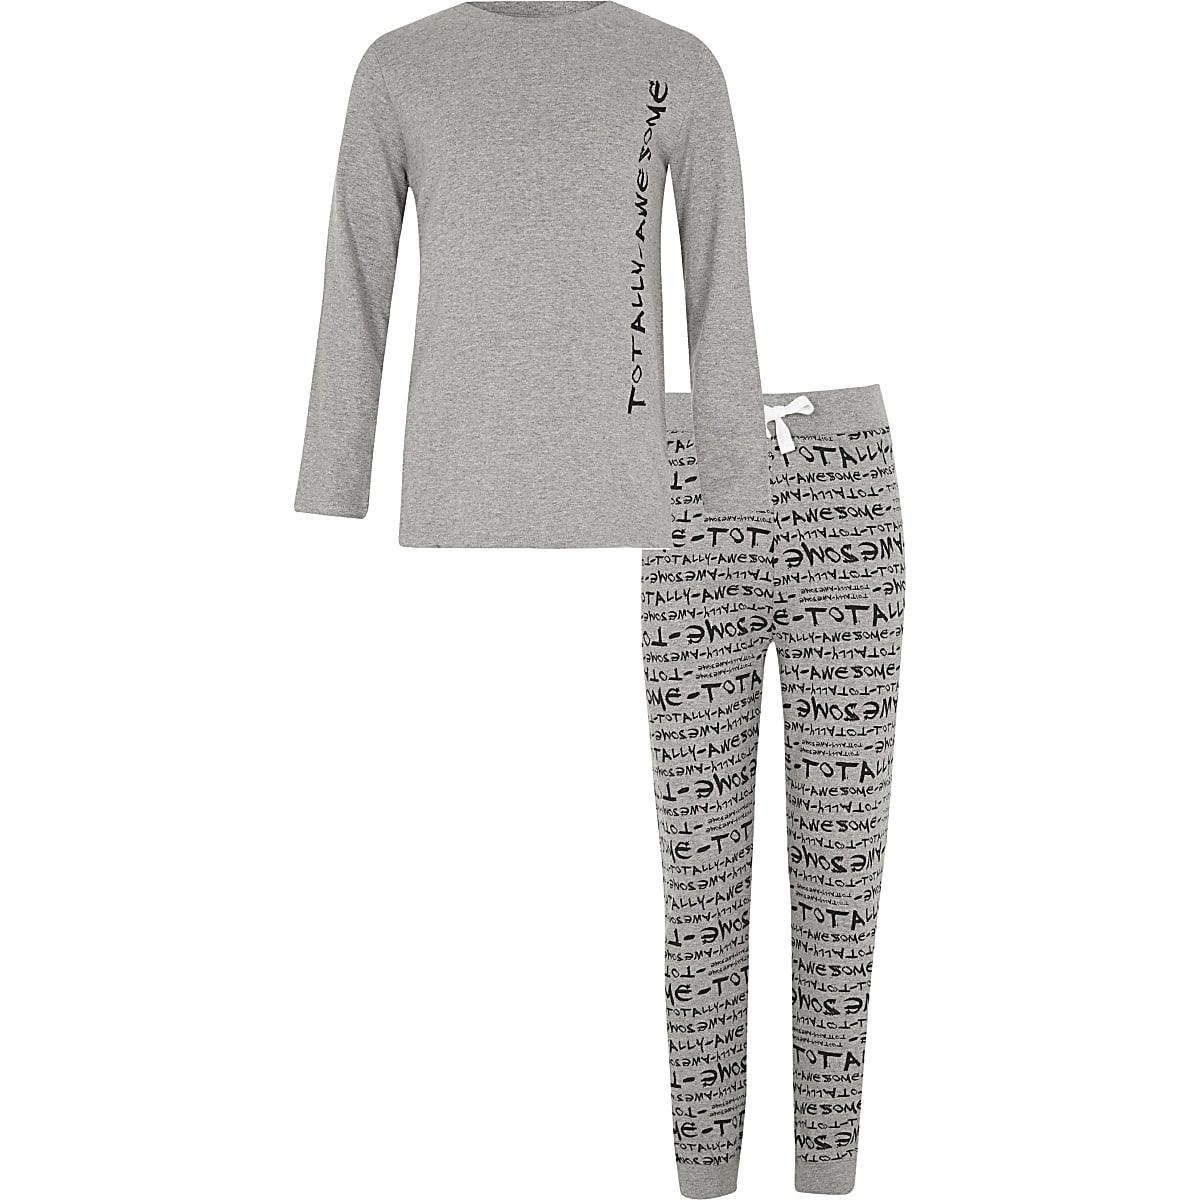 Ensemble de pyjama à imprimé « Totally awesome » gris garçon